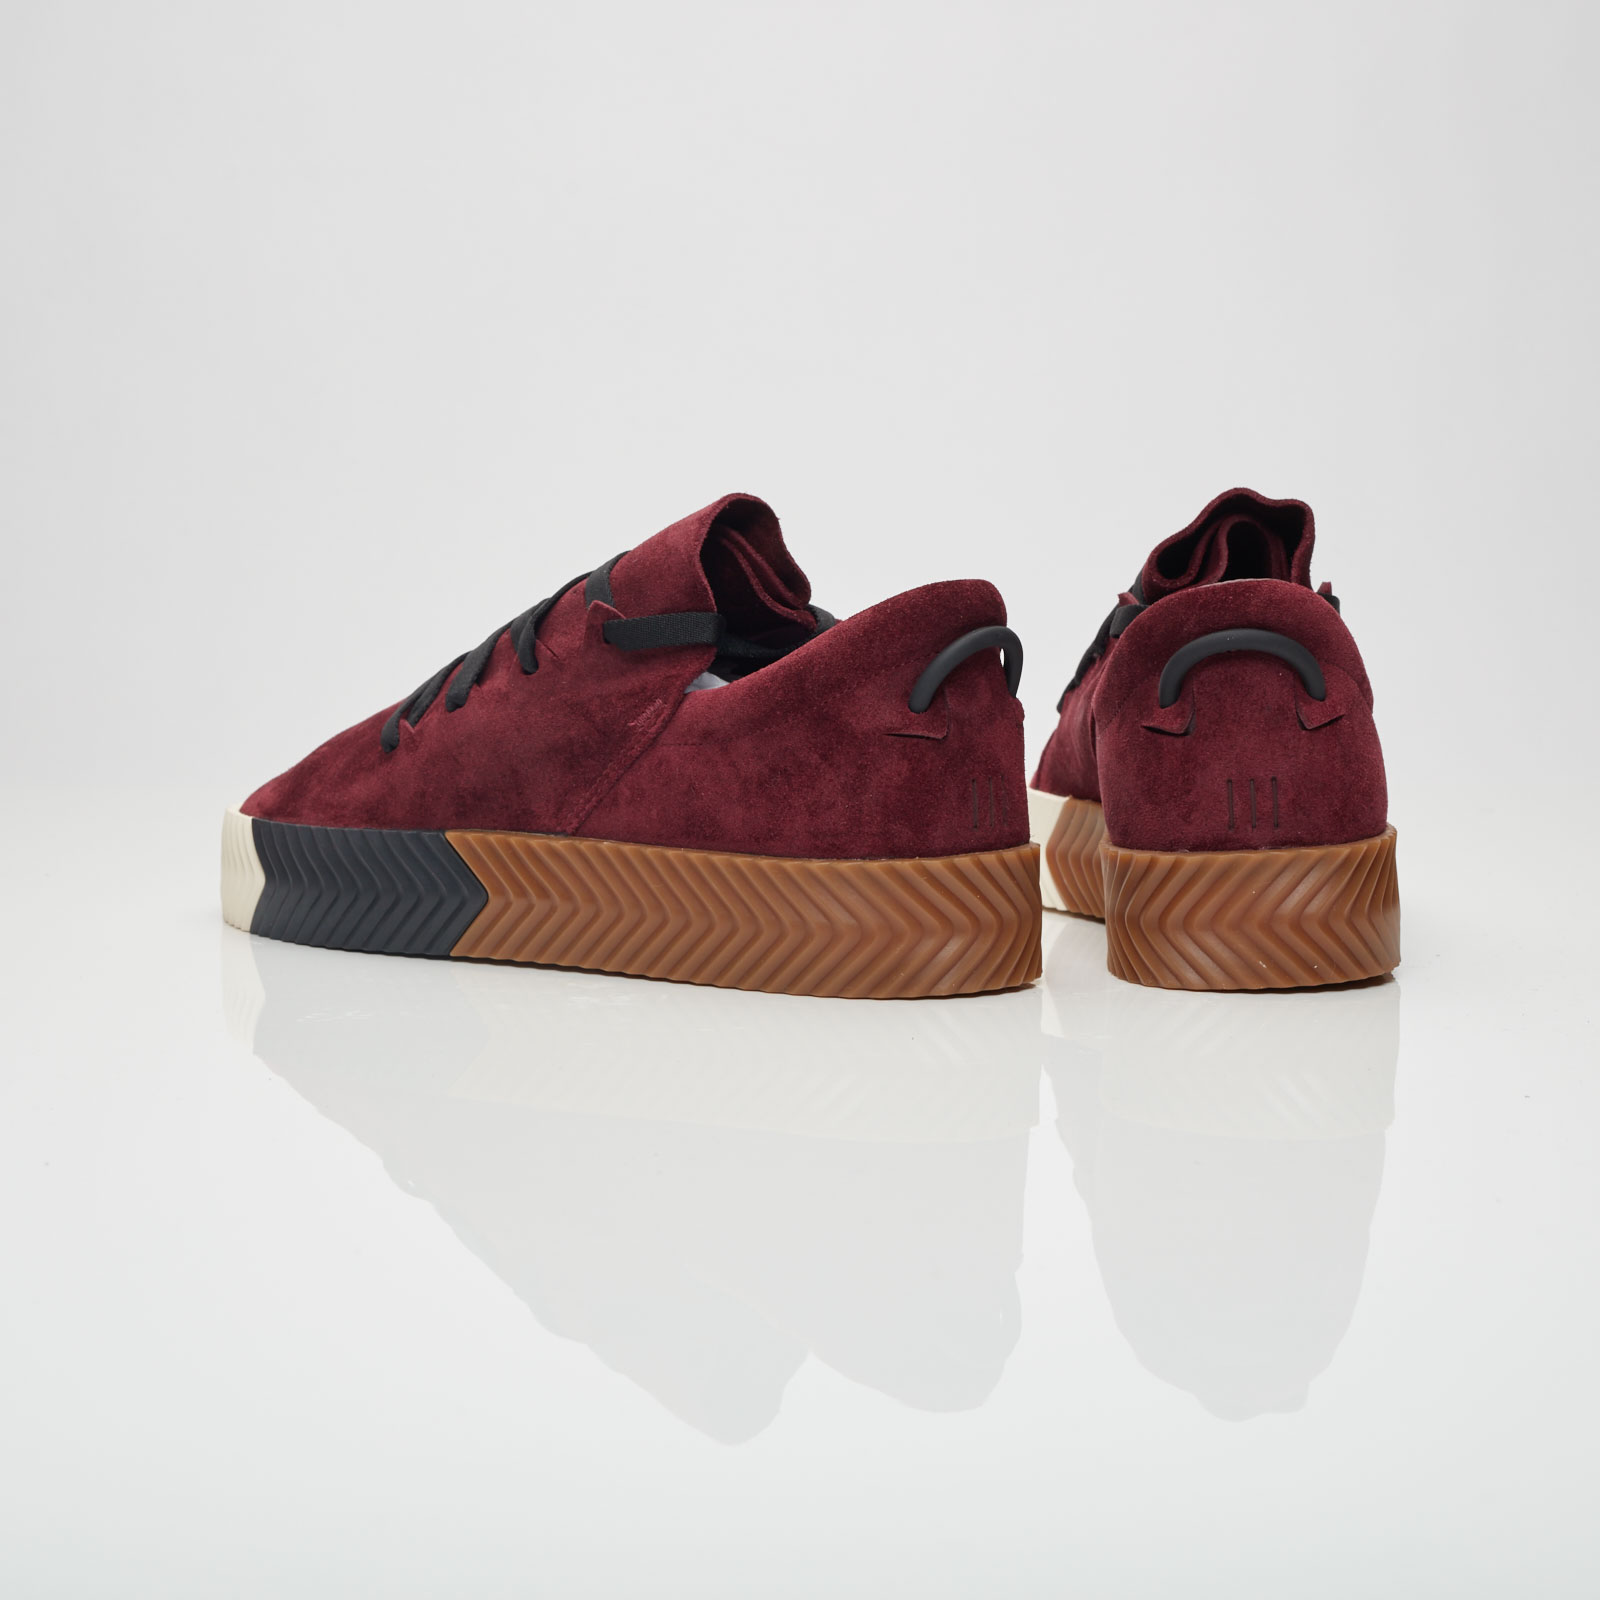 993735e6 adidas AW Skate - By8909 - Sneakersnstuff   sneakers & streetwear online  since 1999